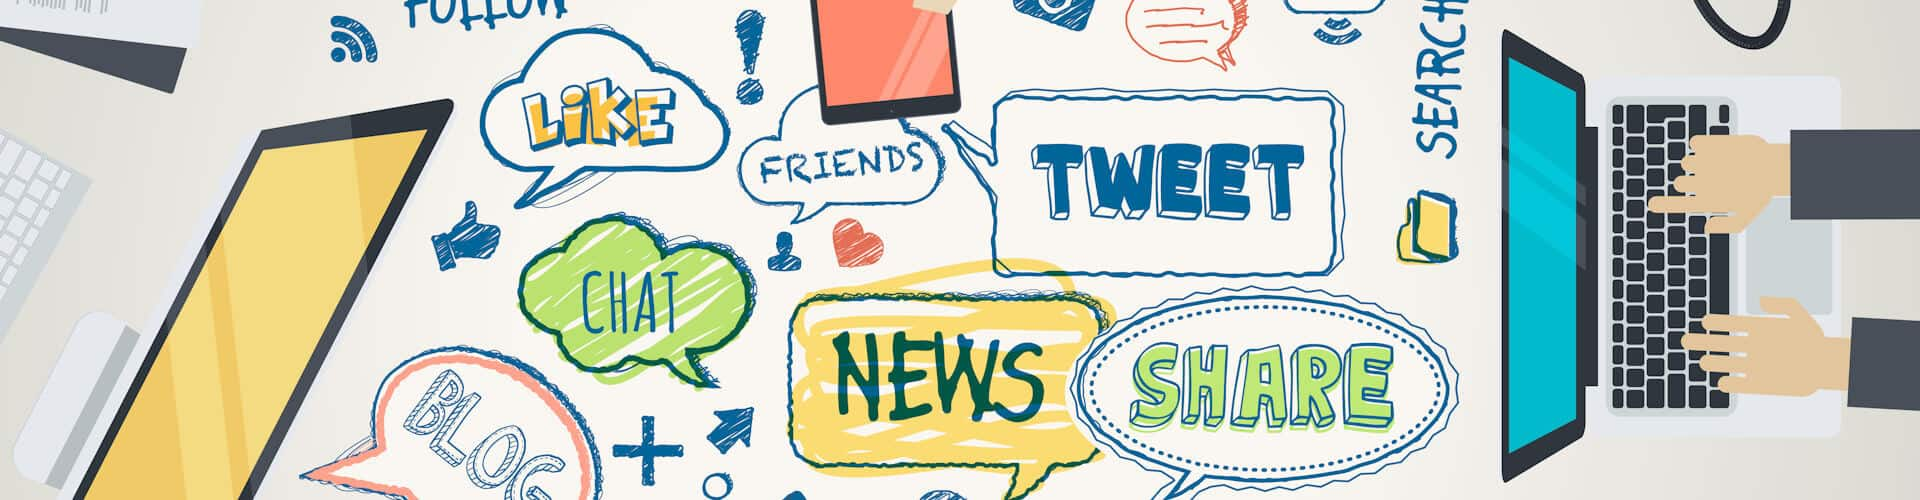 Social Media Marketing Louisville, KY, Management, Strategy